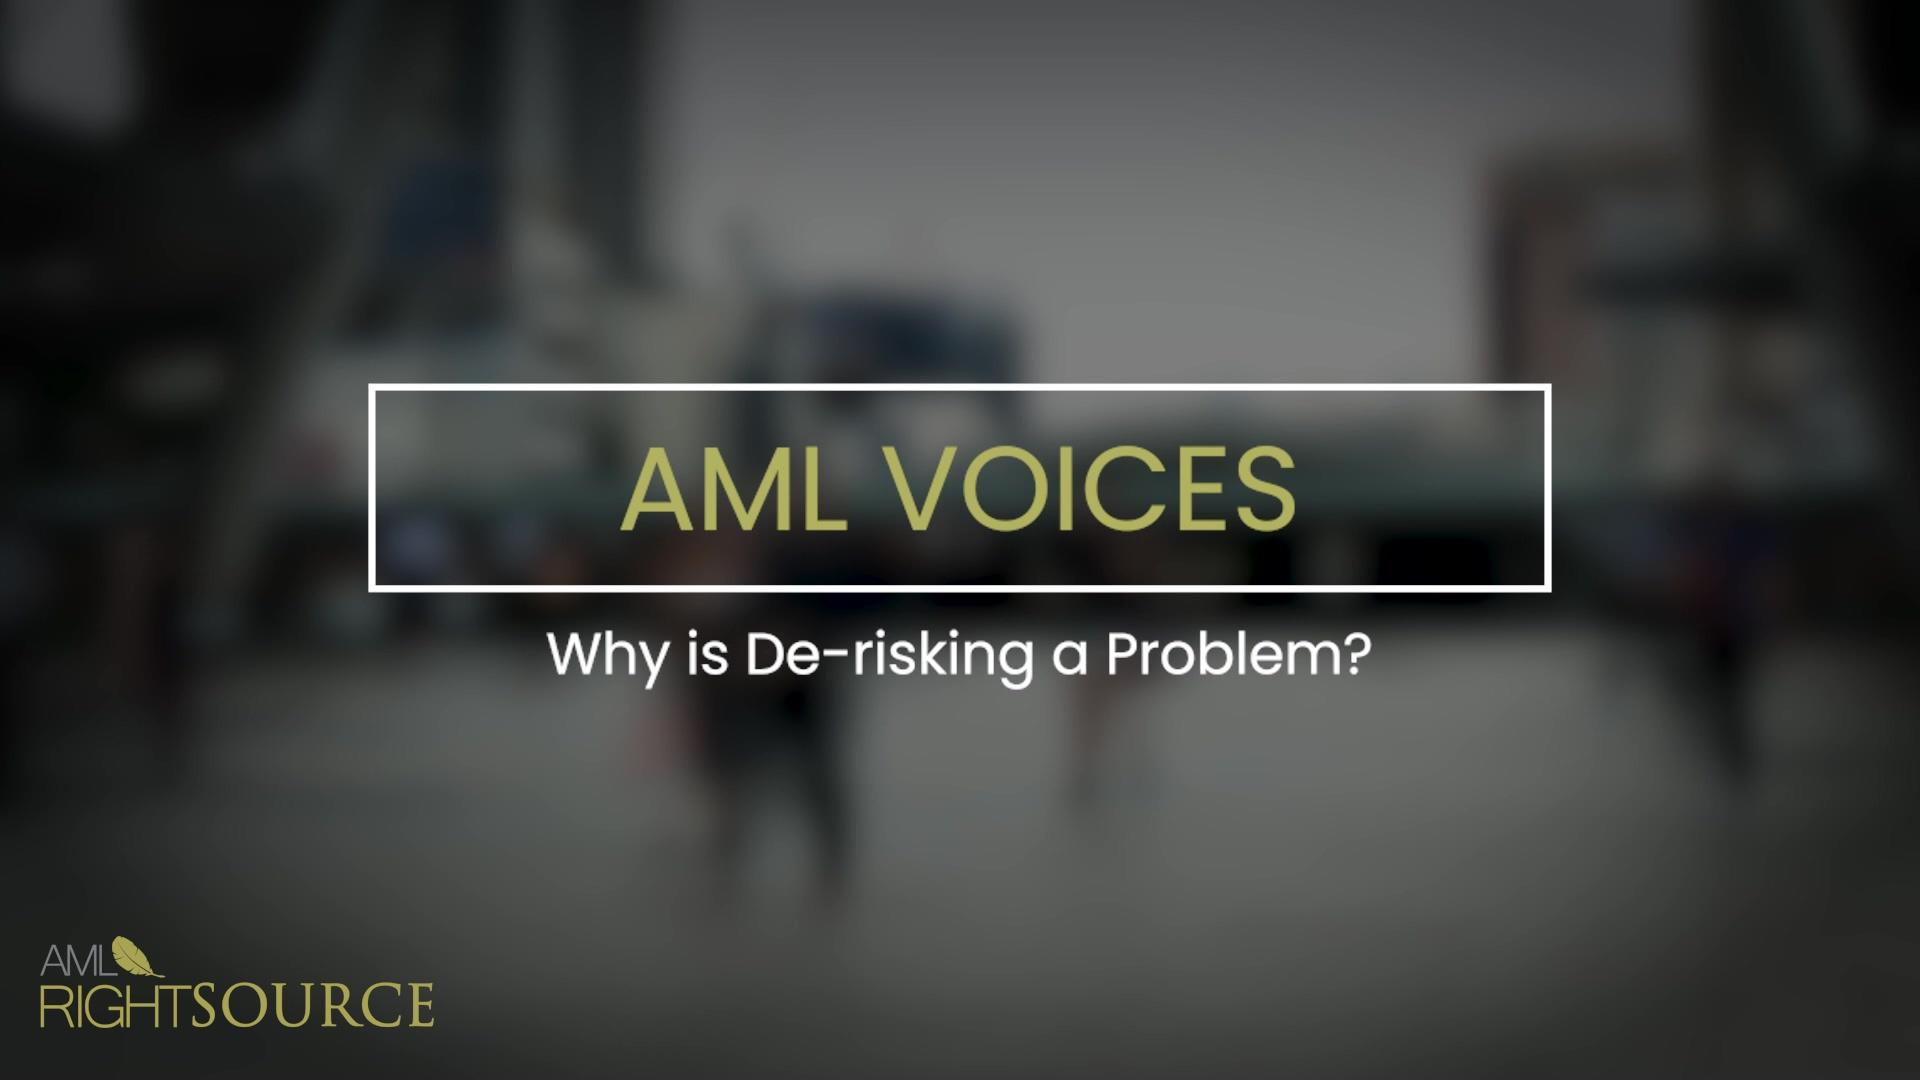 Why is De-risking a Problem